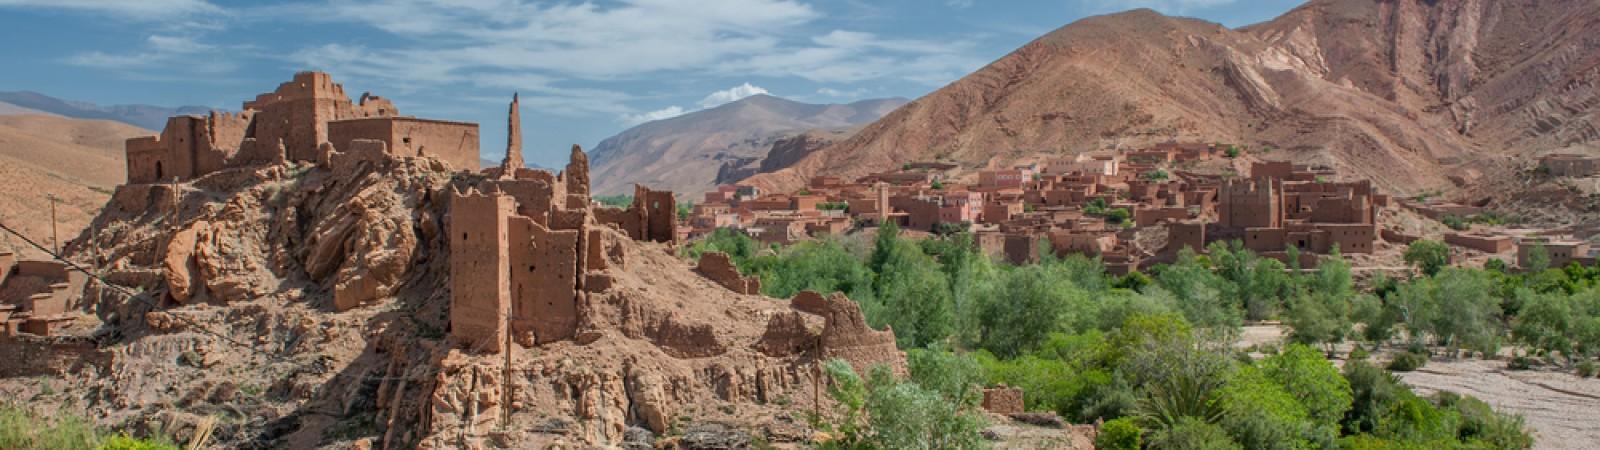 berber-kasbah-52dbd304952e2 (1)